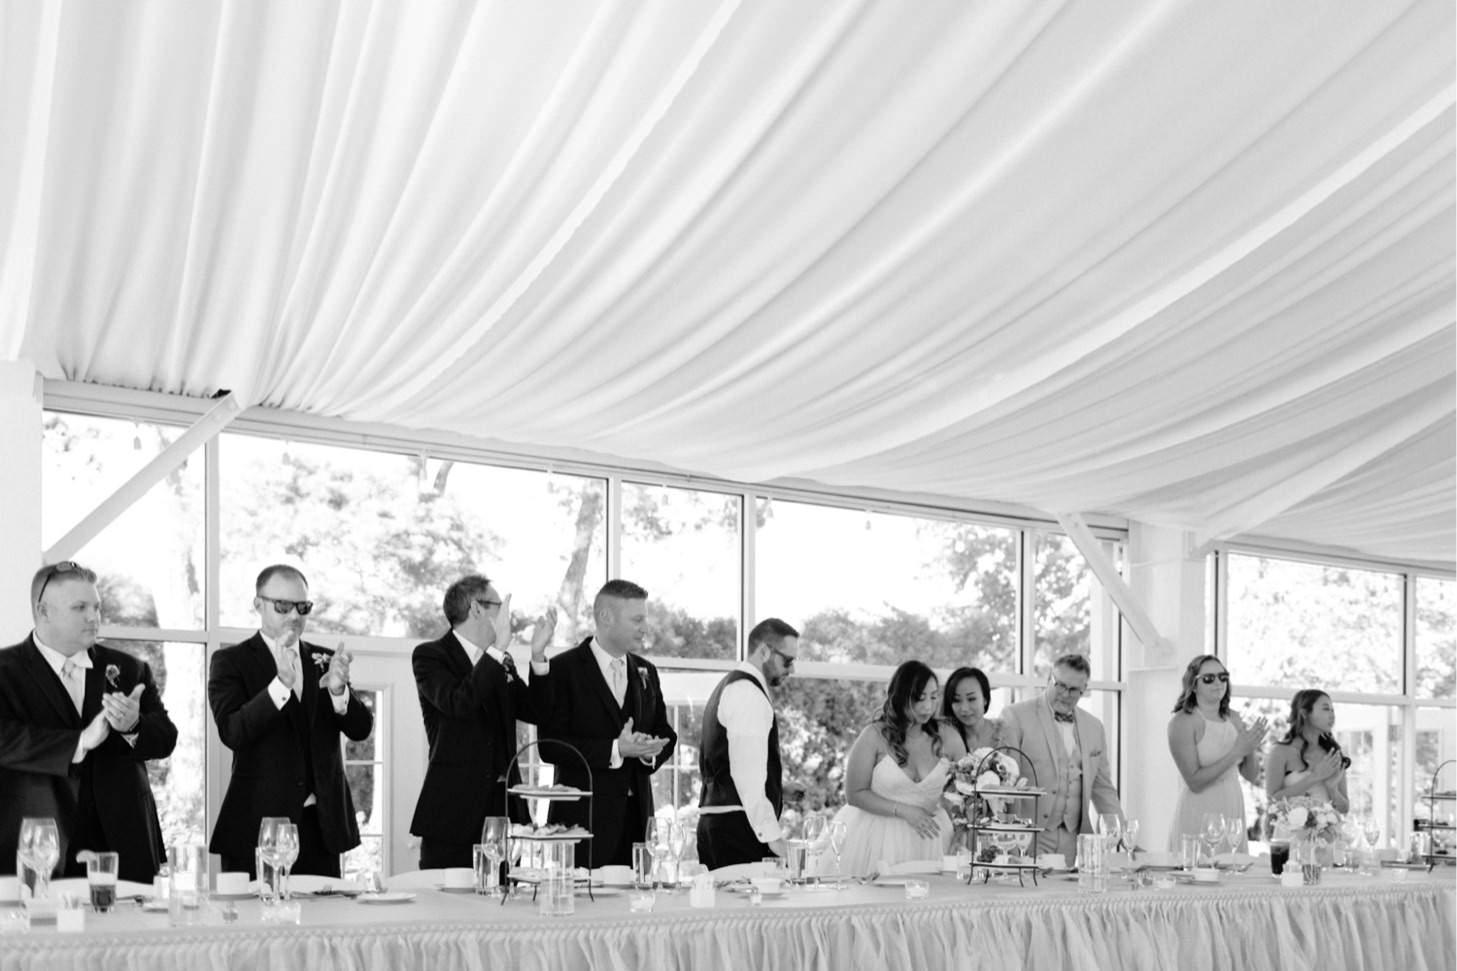 ritz-charles-wedding-reception-downtown-indianapolis-wedding-photographer028.JPG